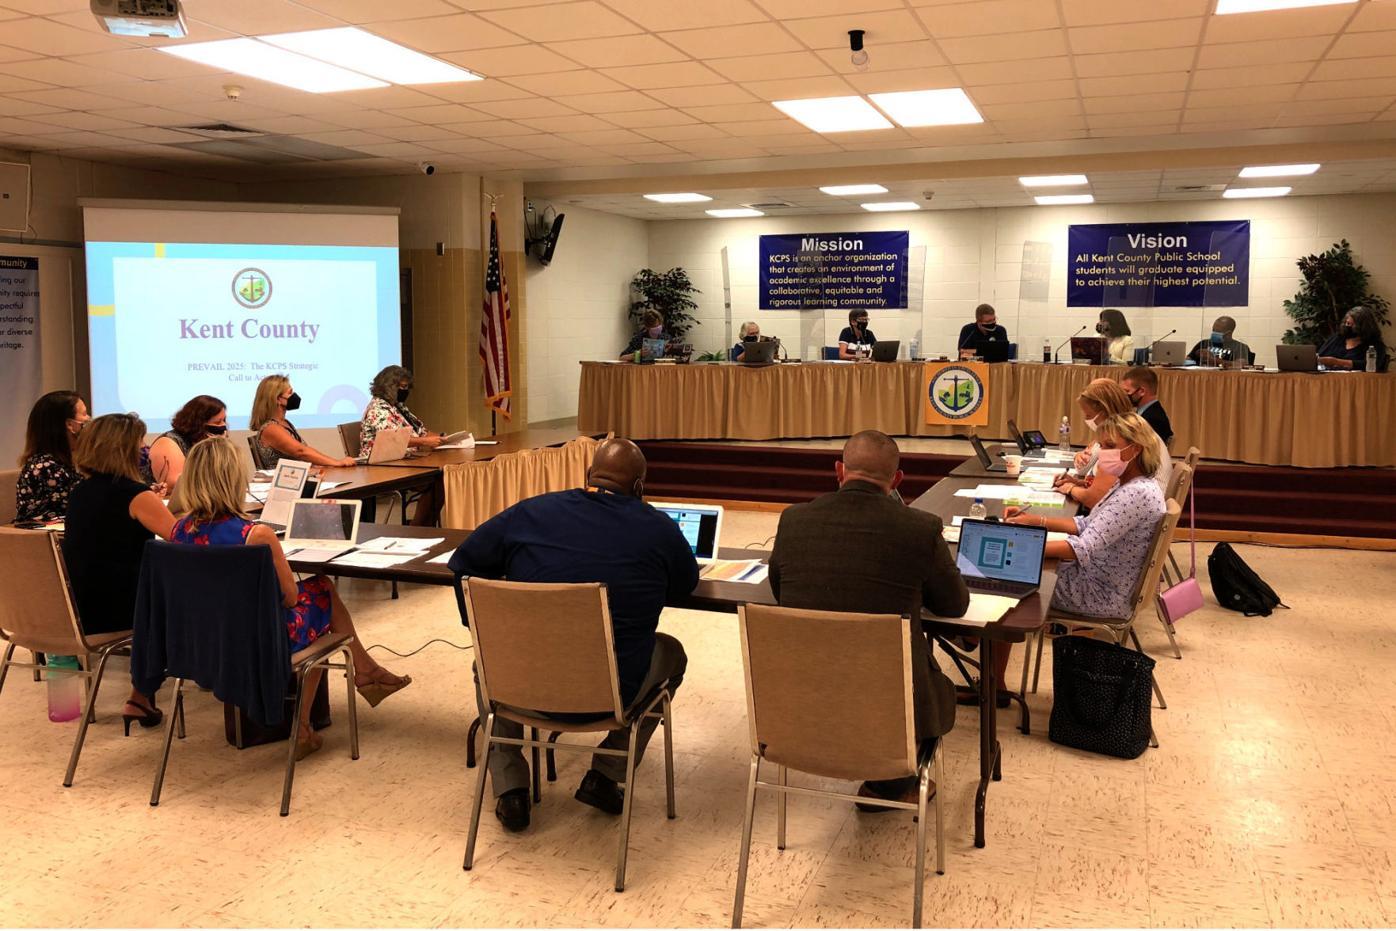 Board discusses strategic plan for improving academics